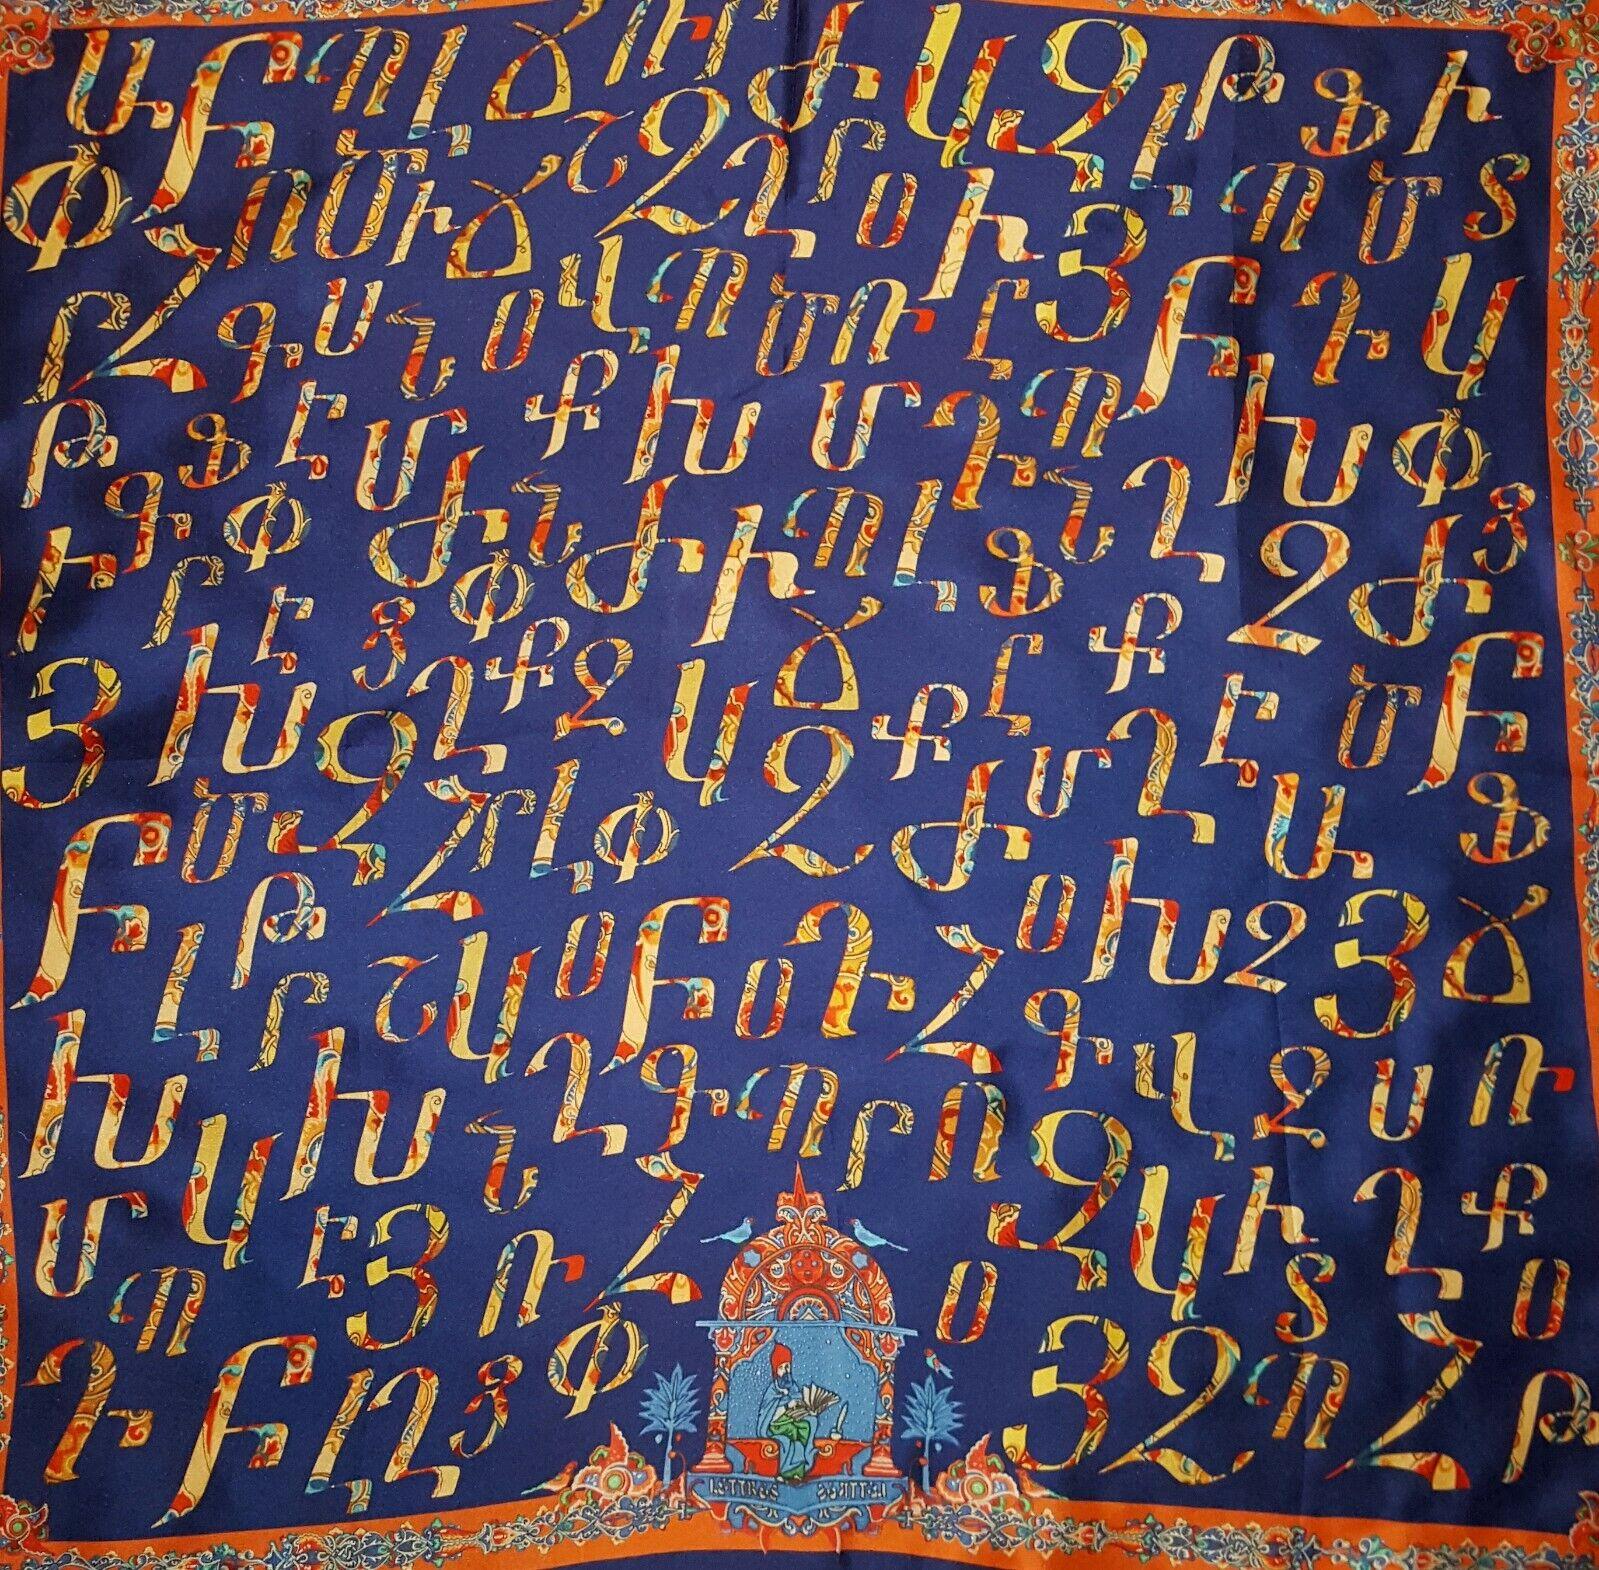 Hand Painted Silk Scarf Armenian Handmade Batik Gift for Her Armenia